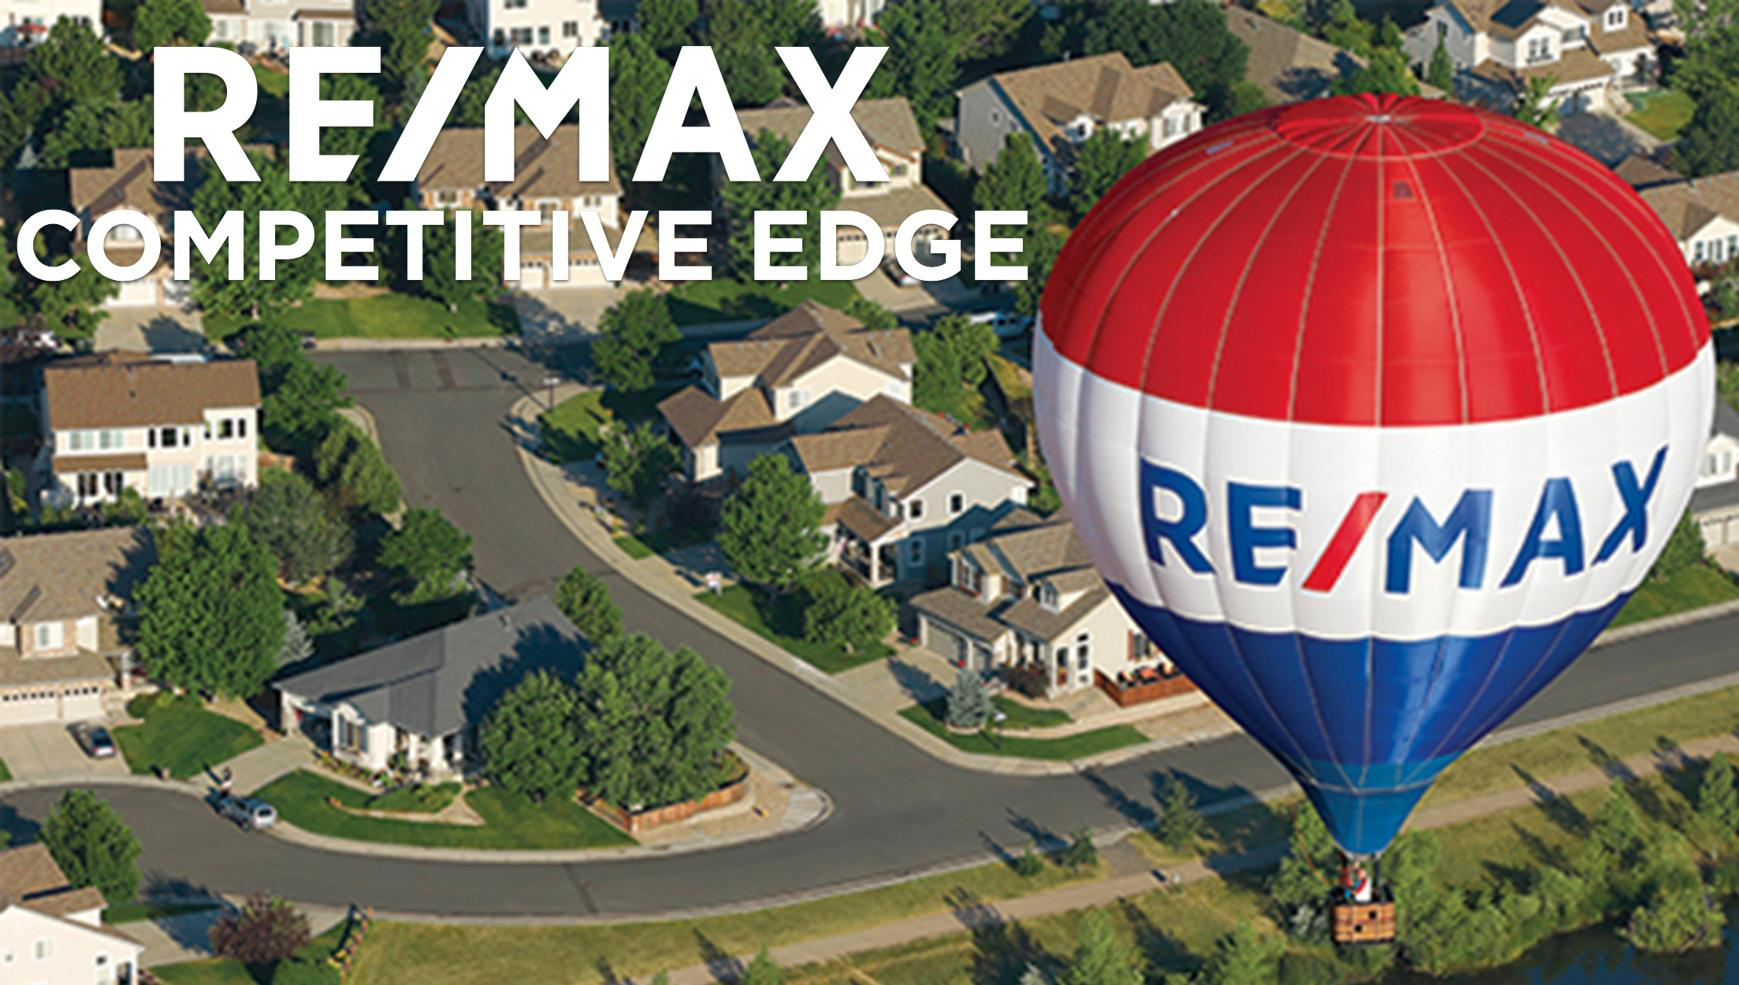 RE/MAX Competitive Edge